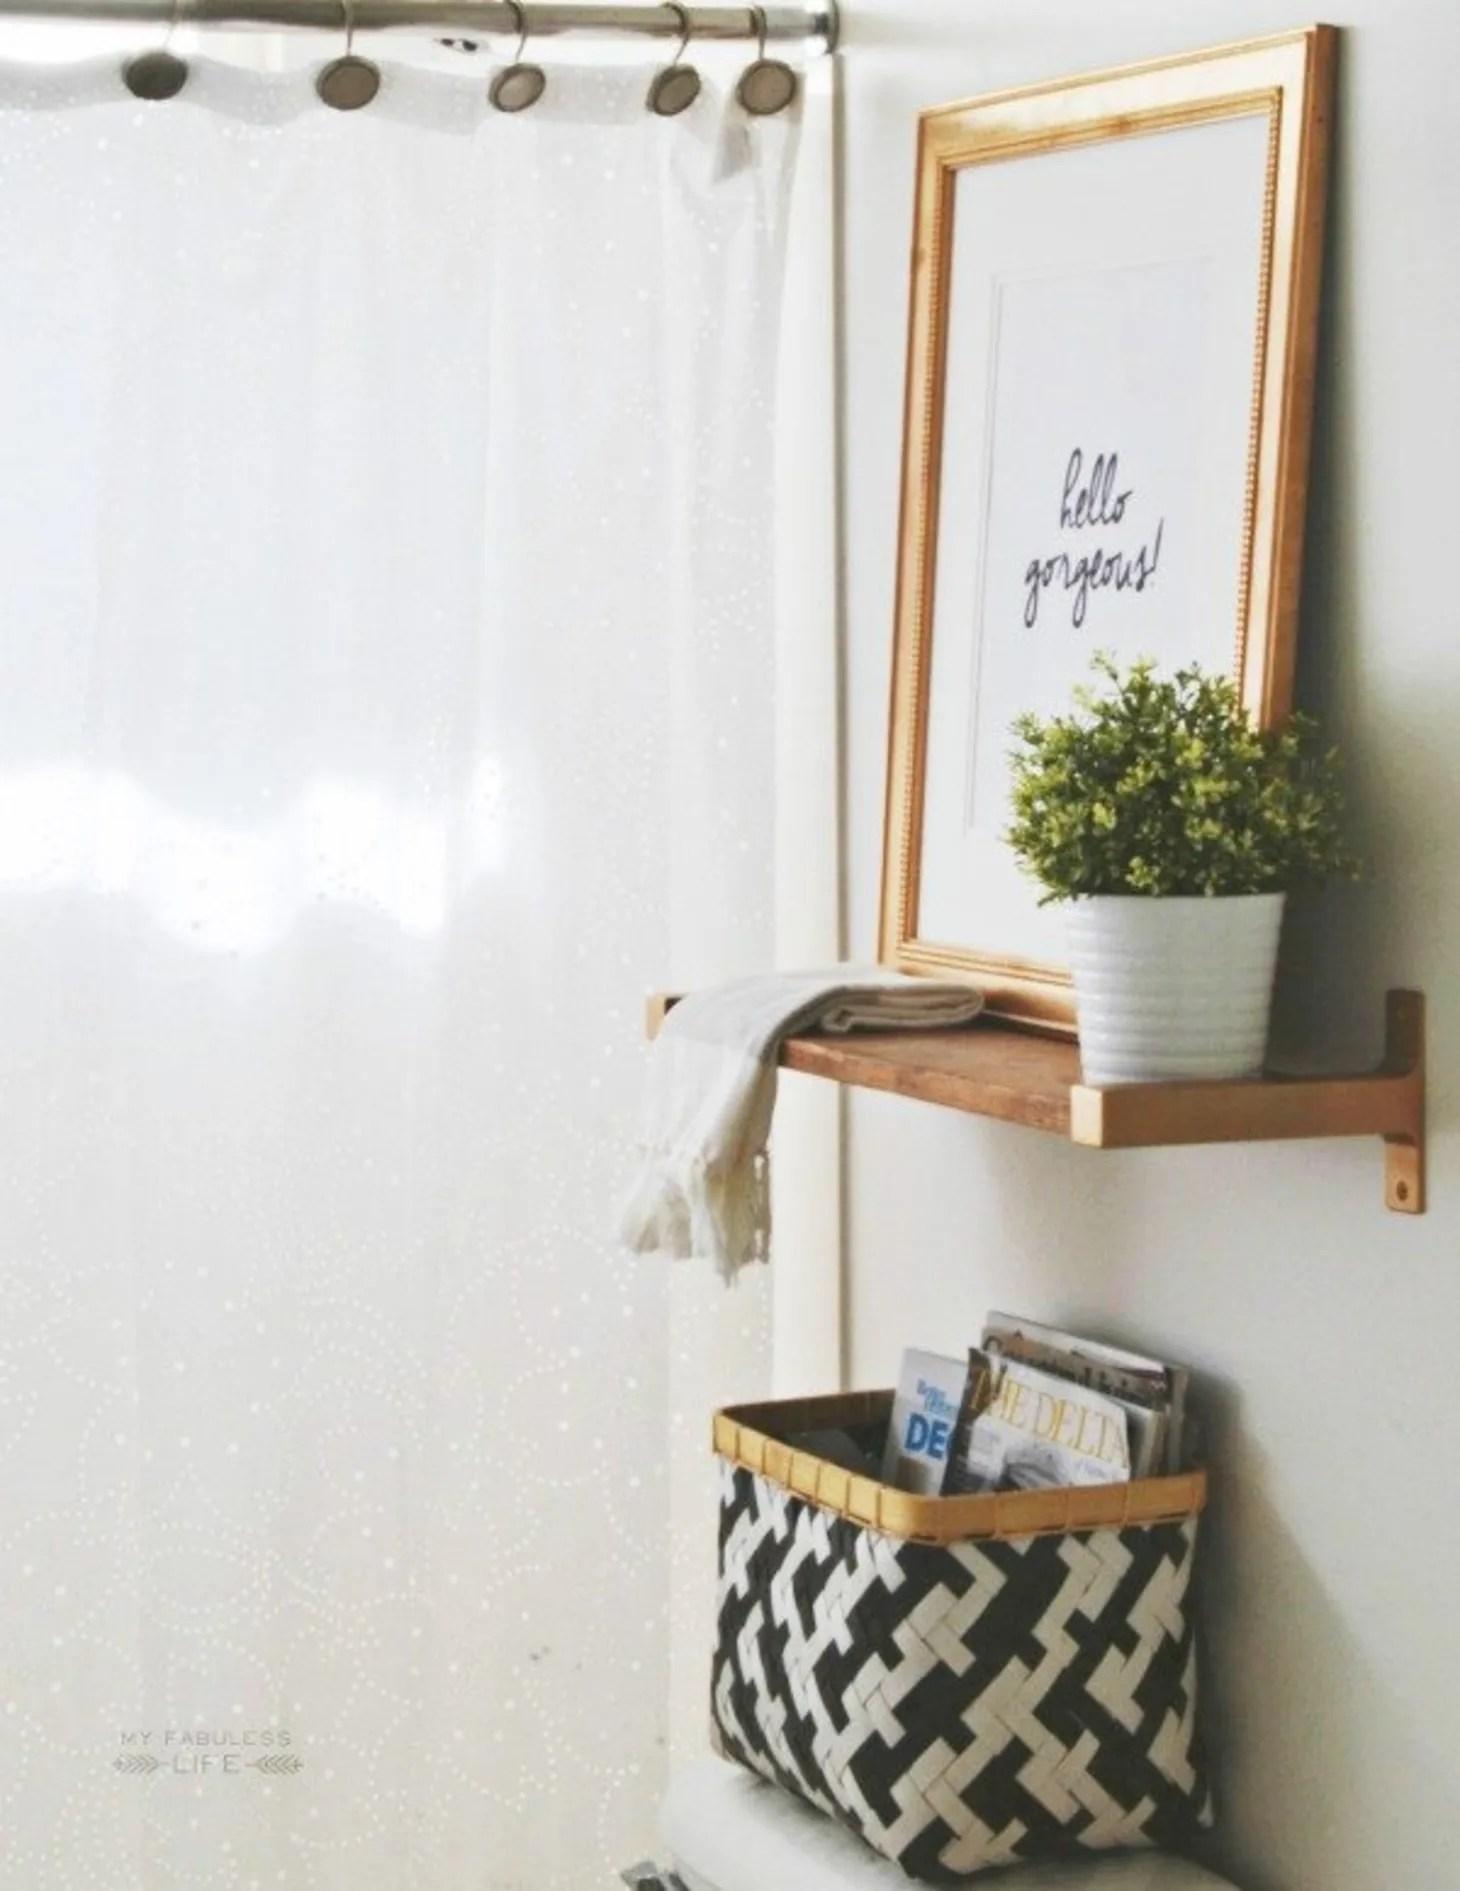 Bathroom Storage Ideas - Storage For Small Bathrooms ... on Small Apartment Bathroom Storage Ideas  id=82455